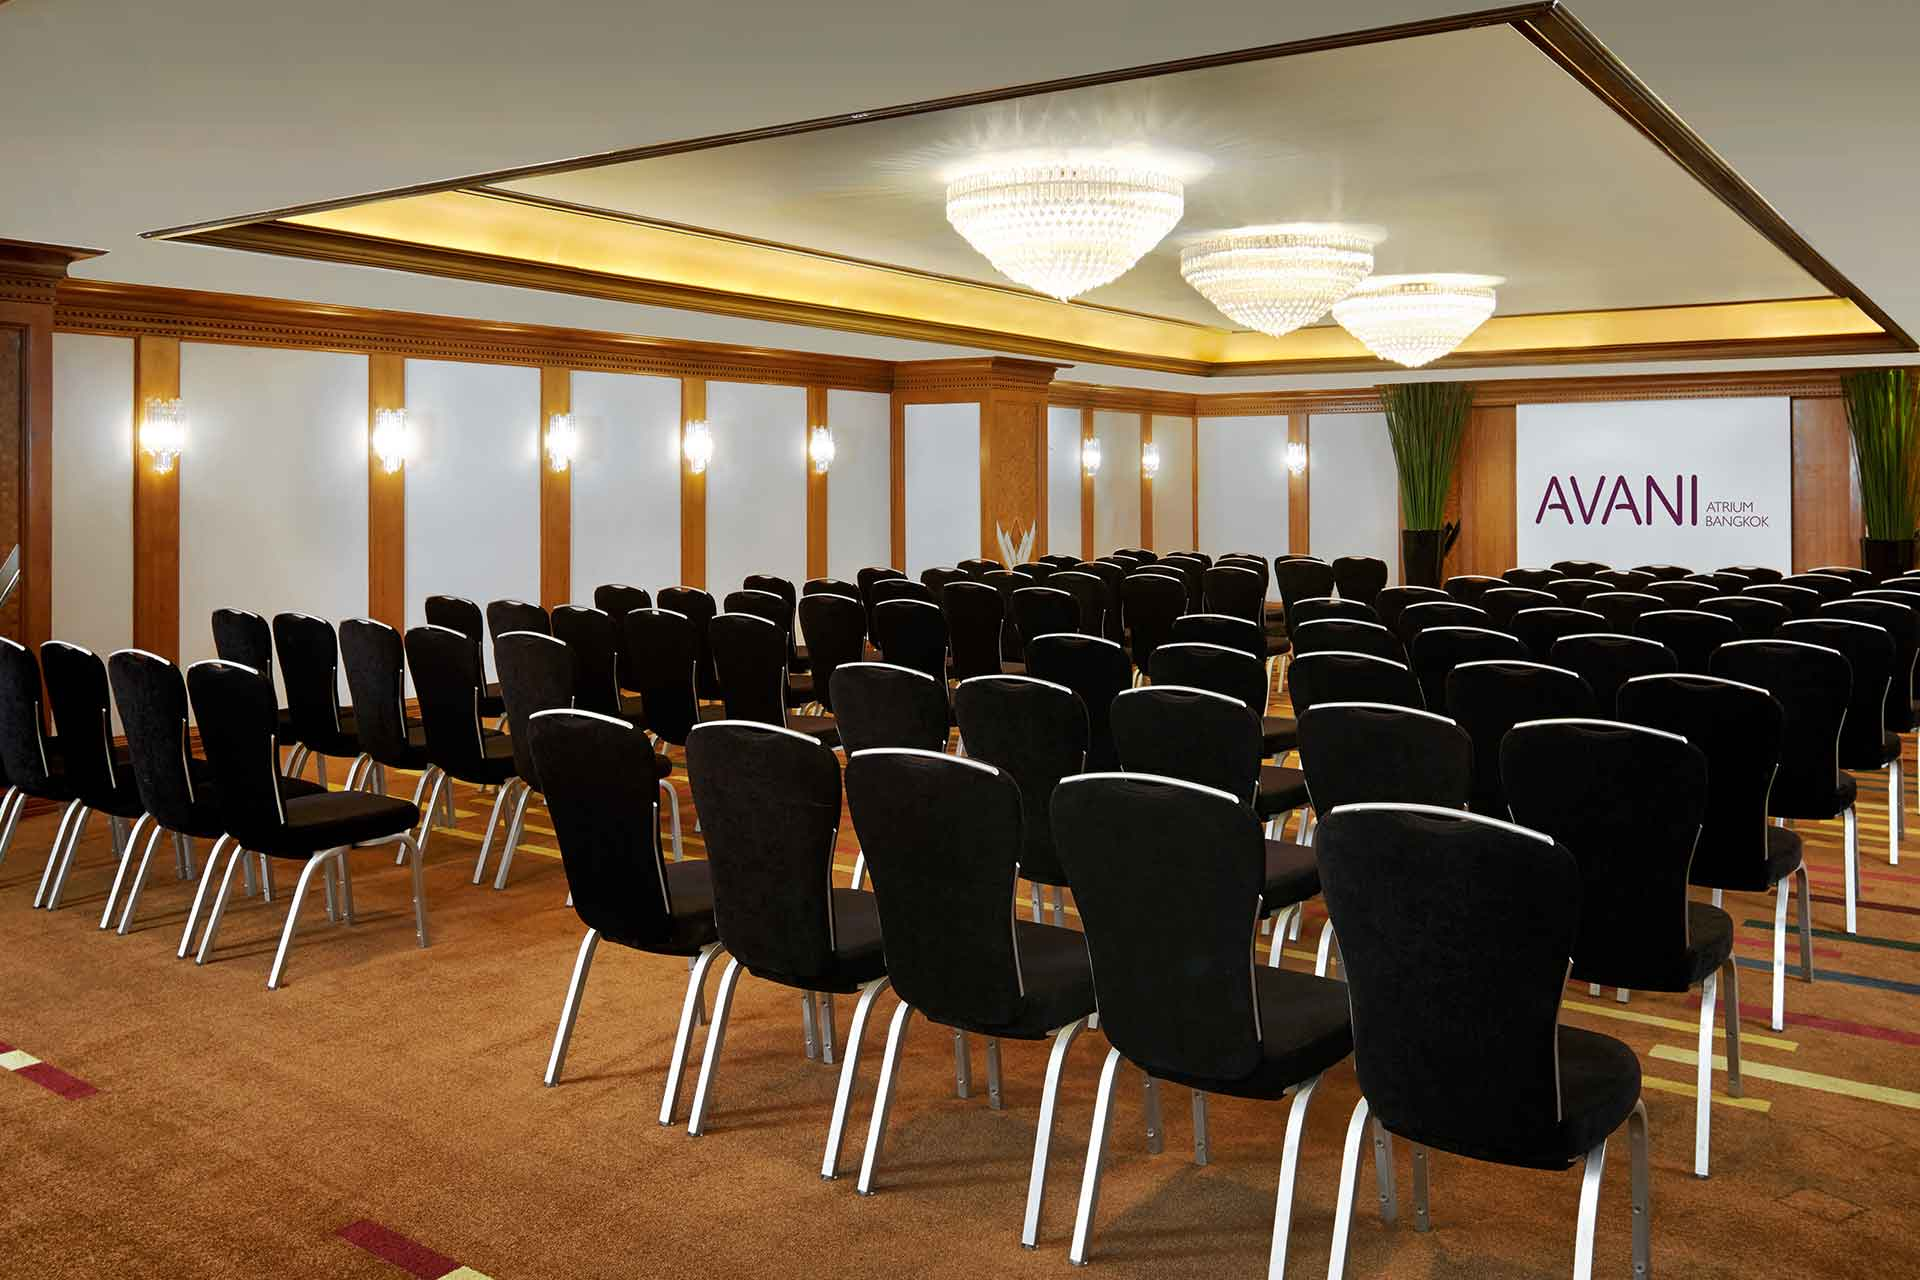 AVANI Atrium Pailin room theater classroom set up